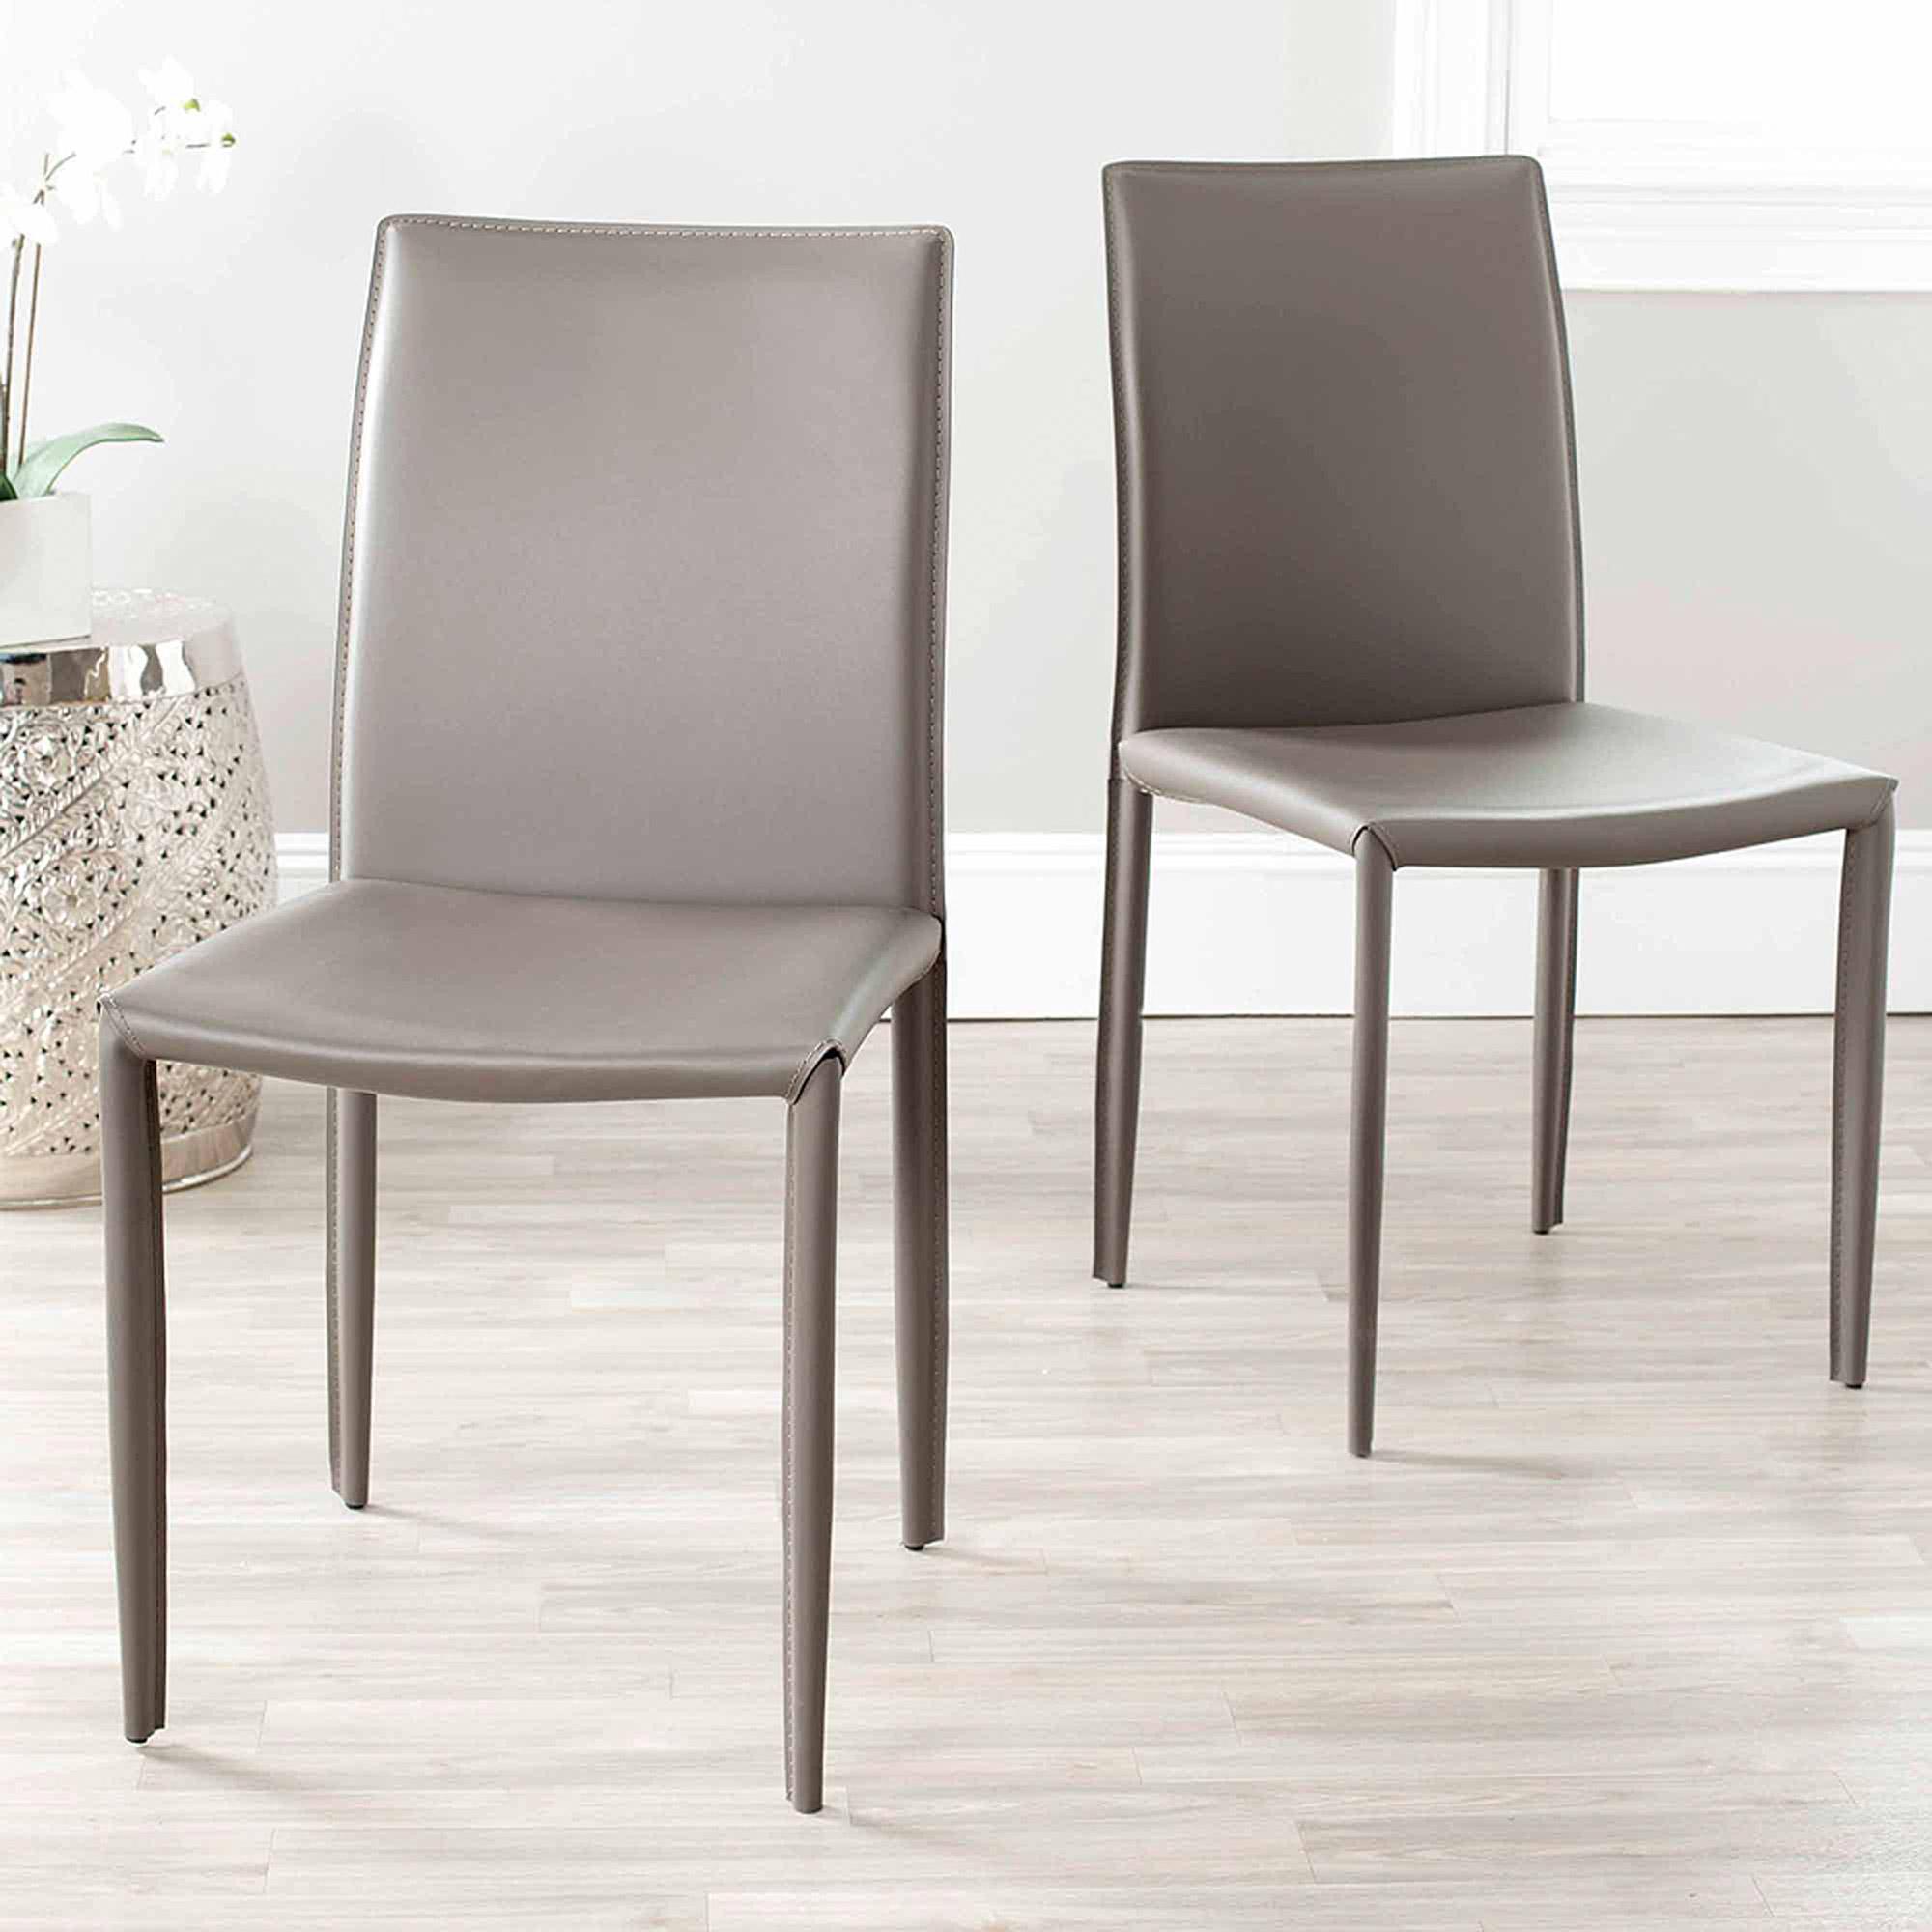 Safavieh Karna Dining Chair, Set of 2